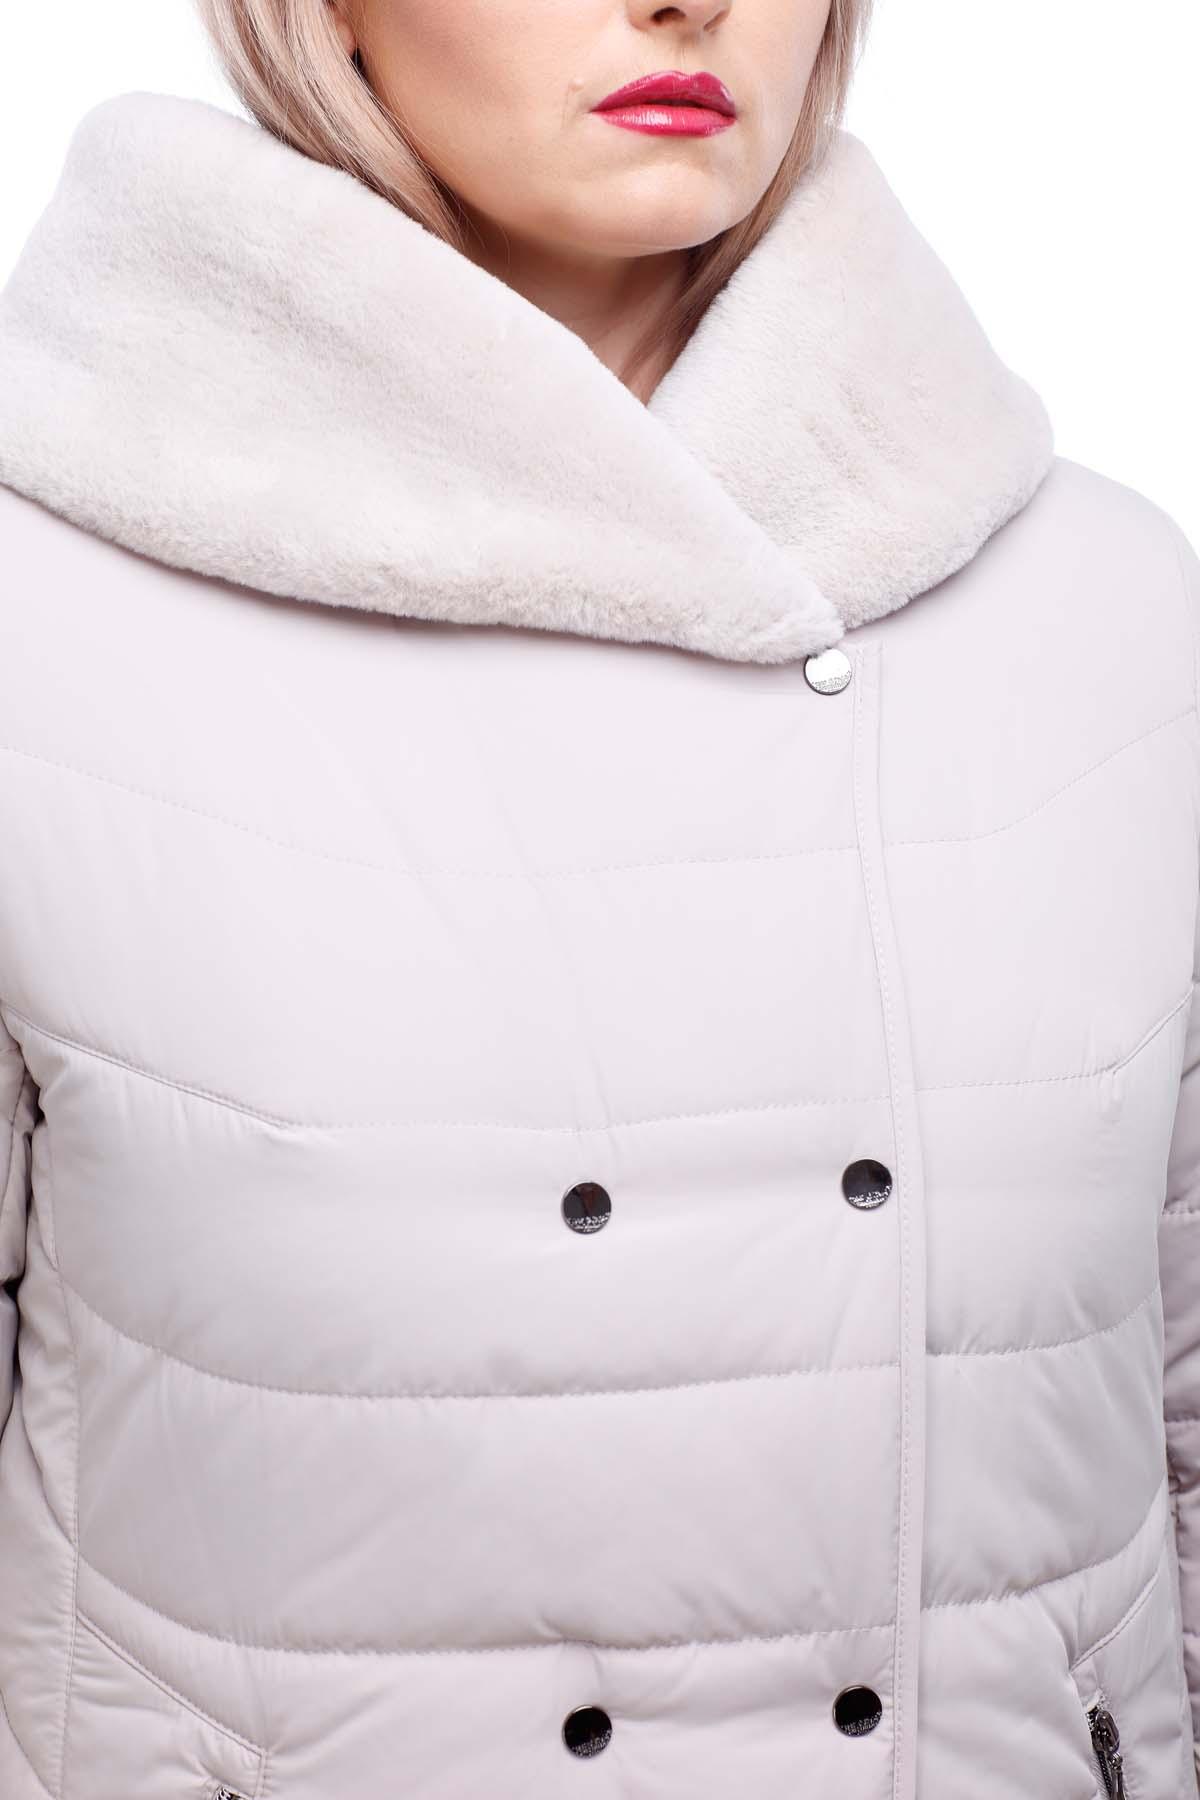 Зимове пальто стьогане Кім Зима, кролик пломбир